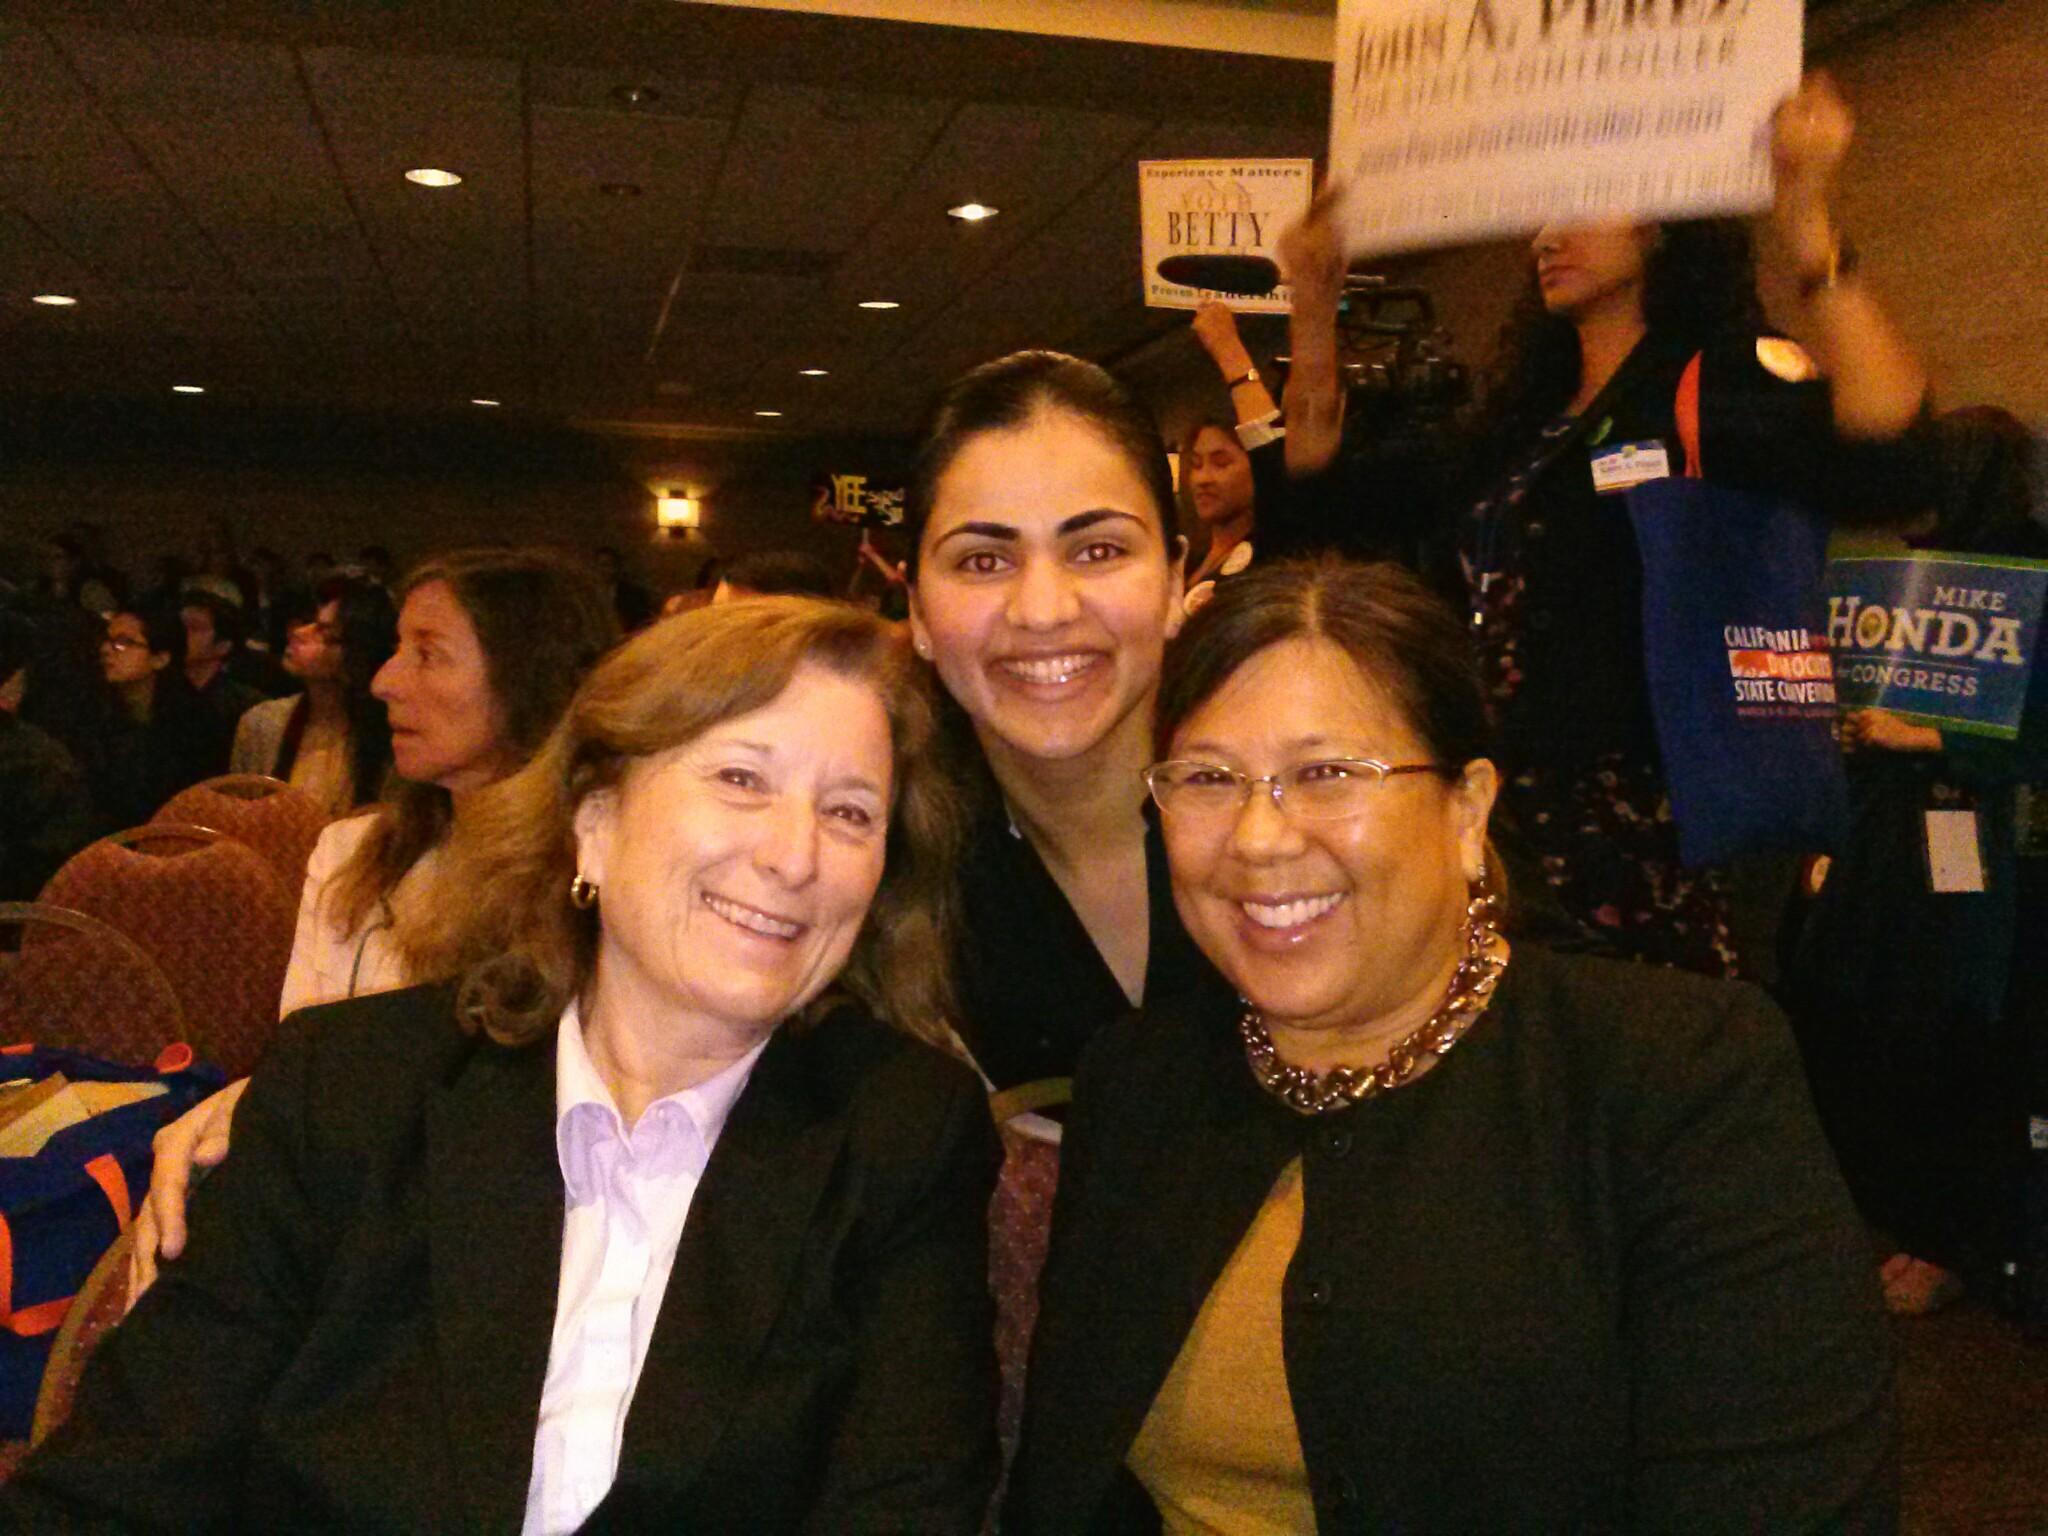 Senator Ellen Corbett and CA State Controller Betty Yee